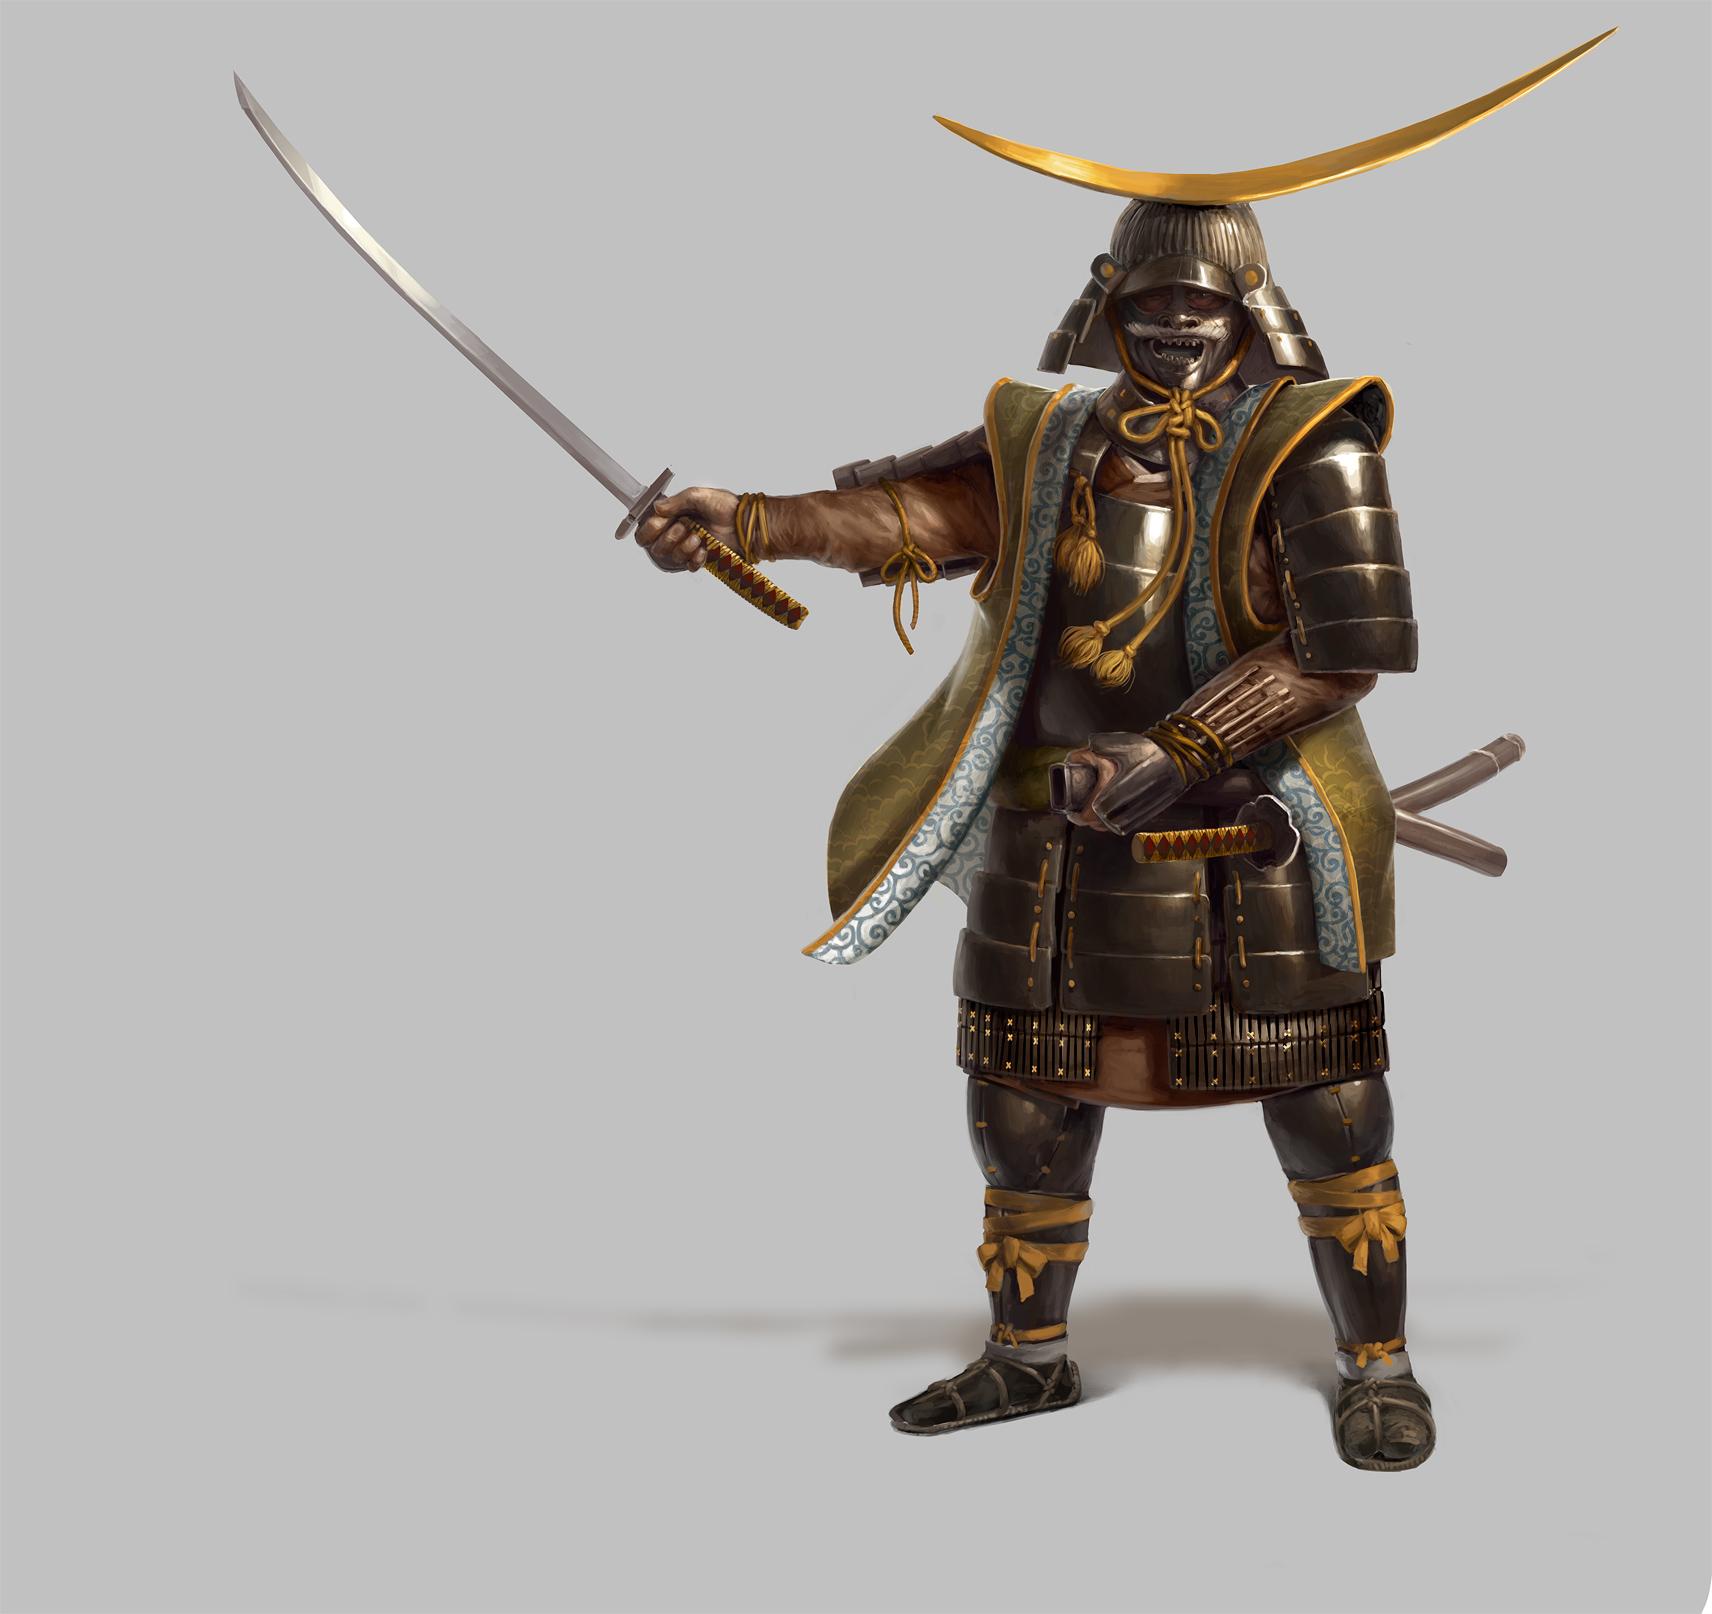 Anand Name 3d Wallpaper Sega Releases New Screenshots For Shogun 2 Total War